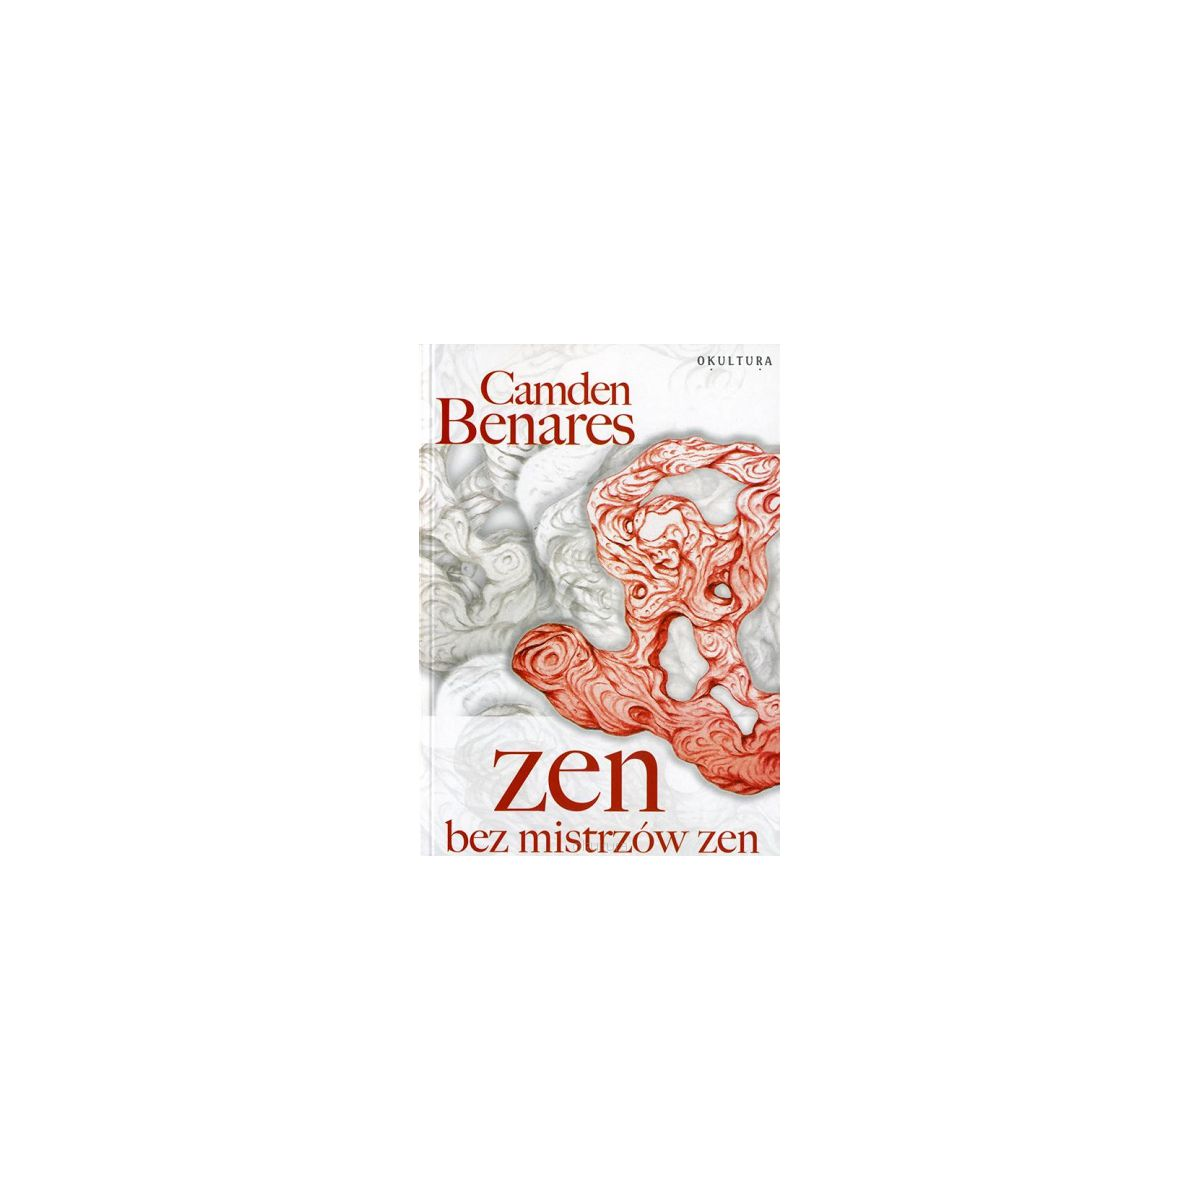 Zen bez mistrzów zen - Camden Benares